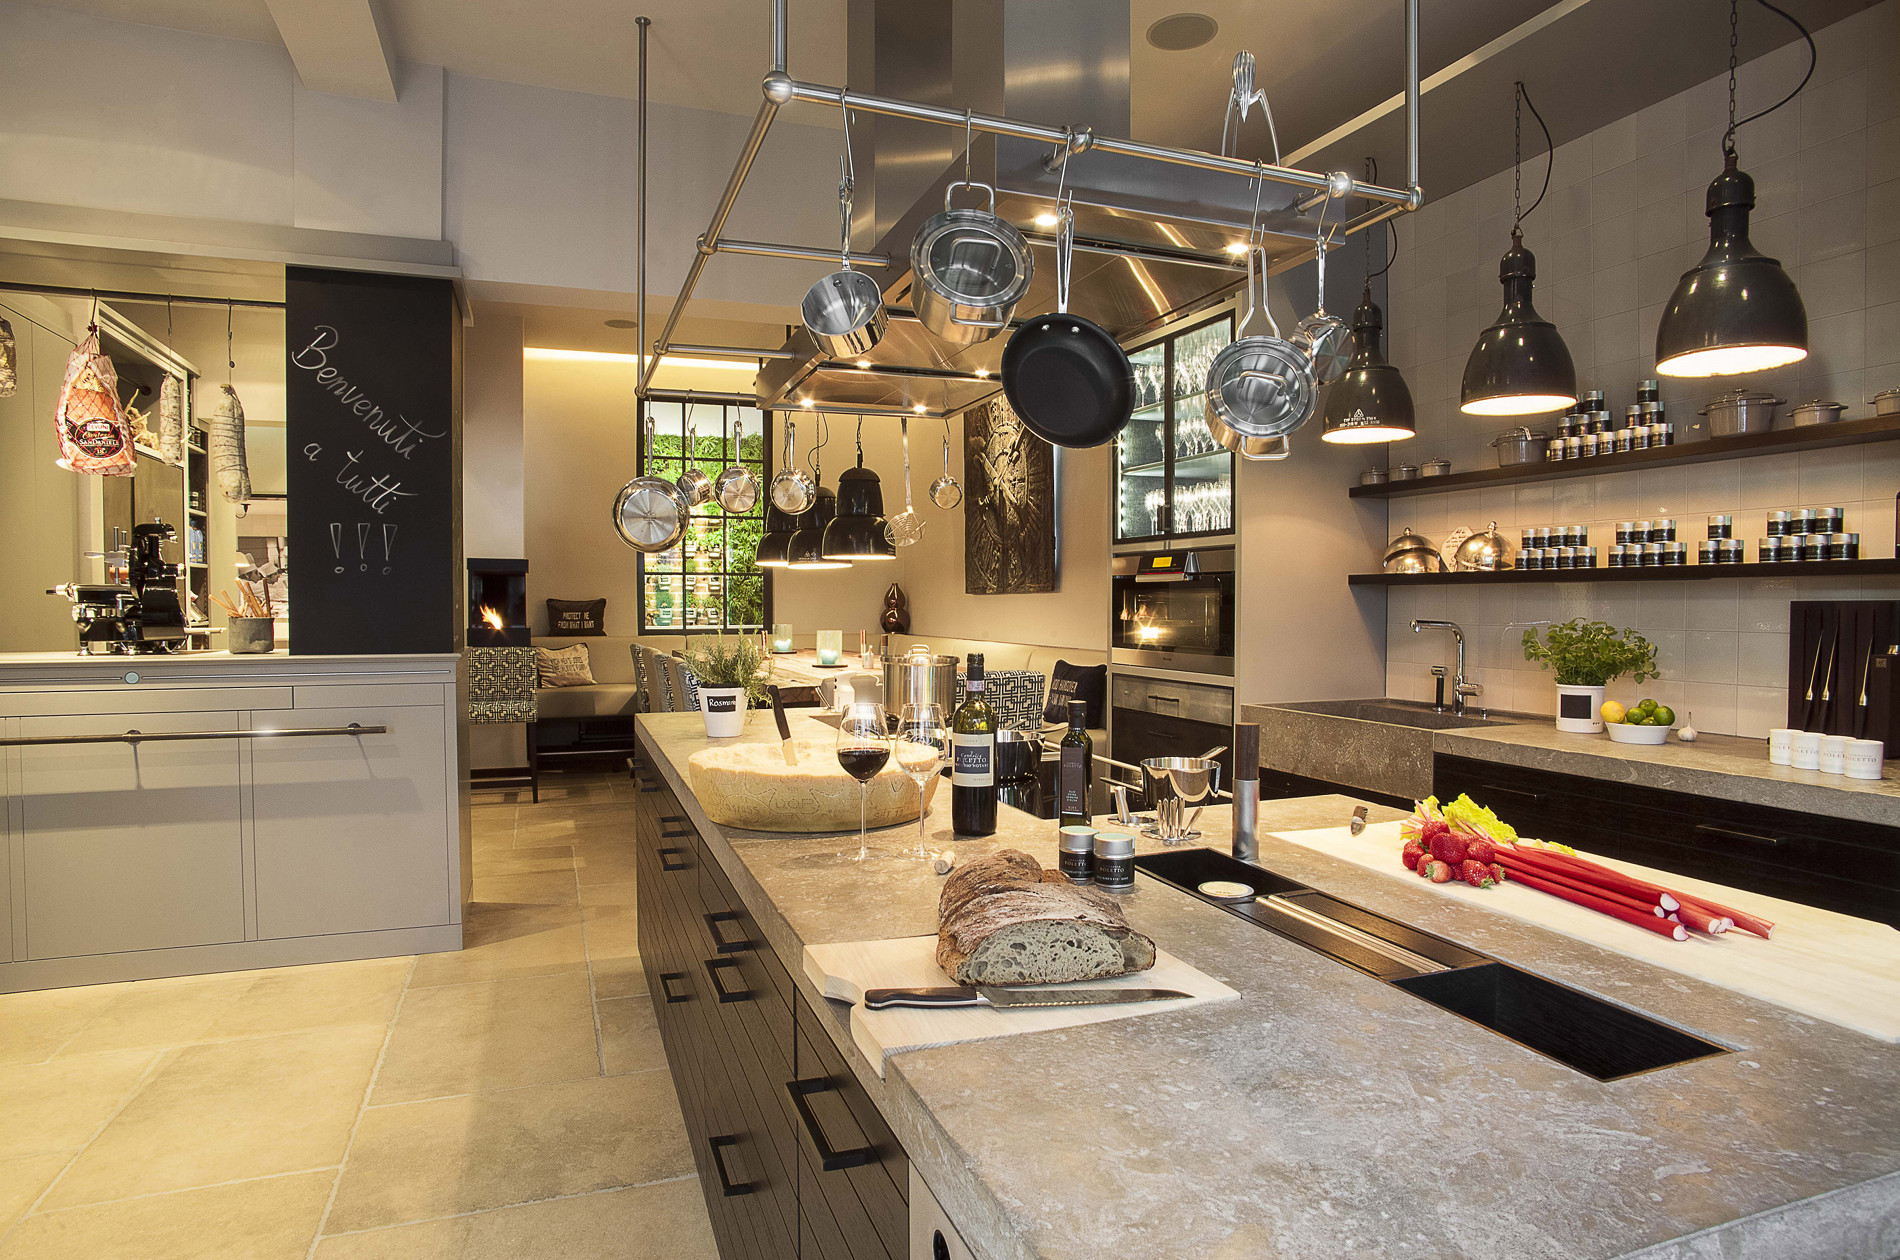 Cucina Cornelia Poletto   cookionista